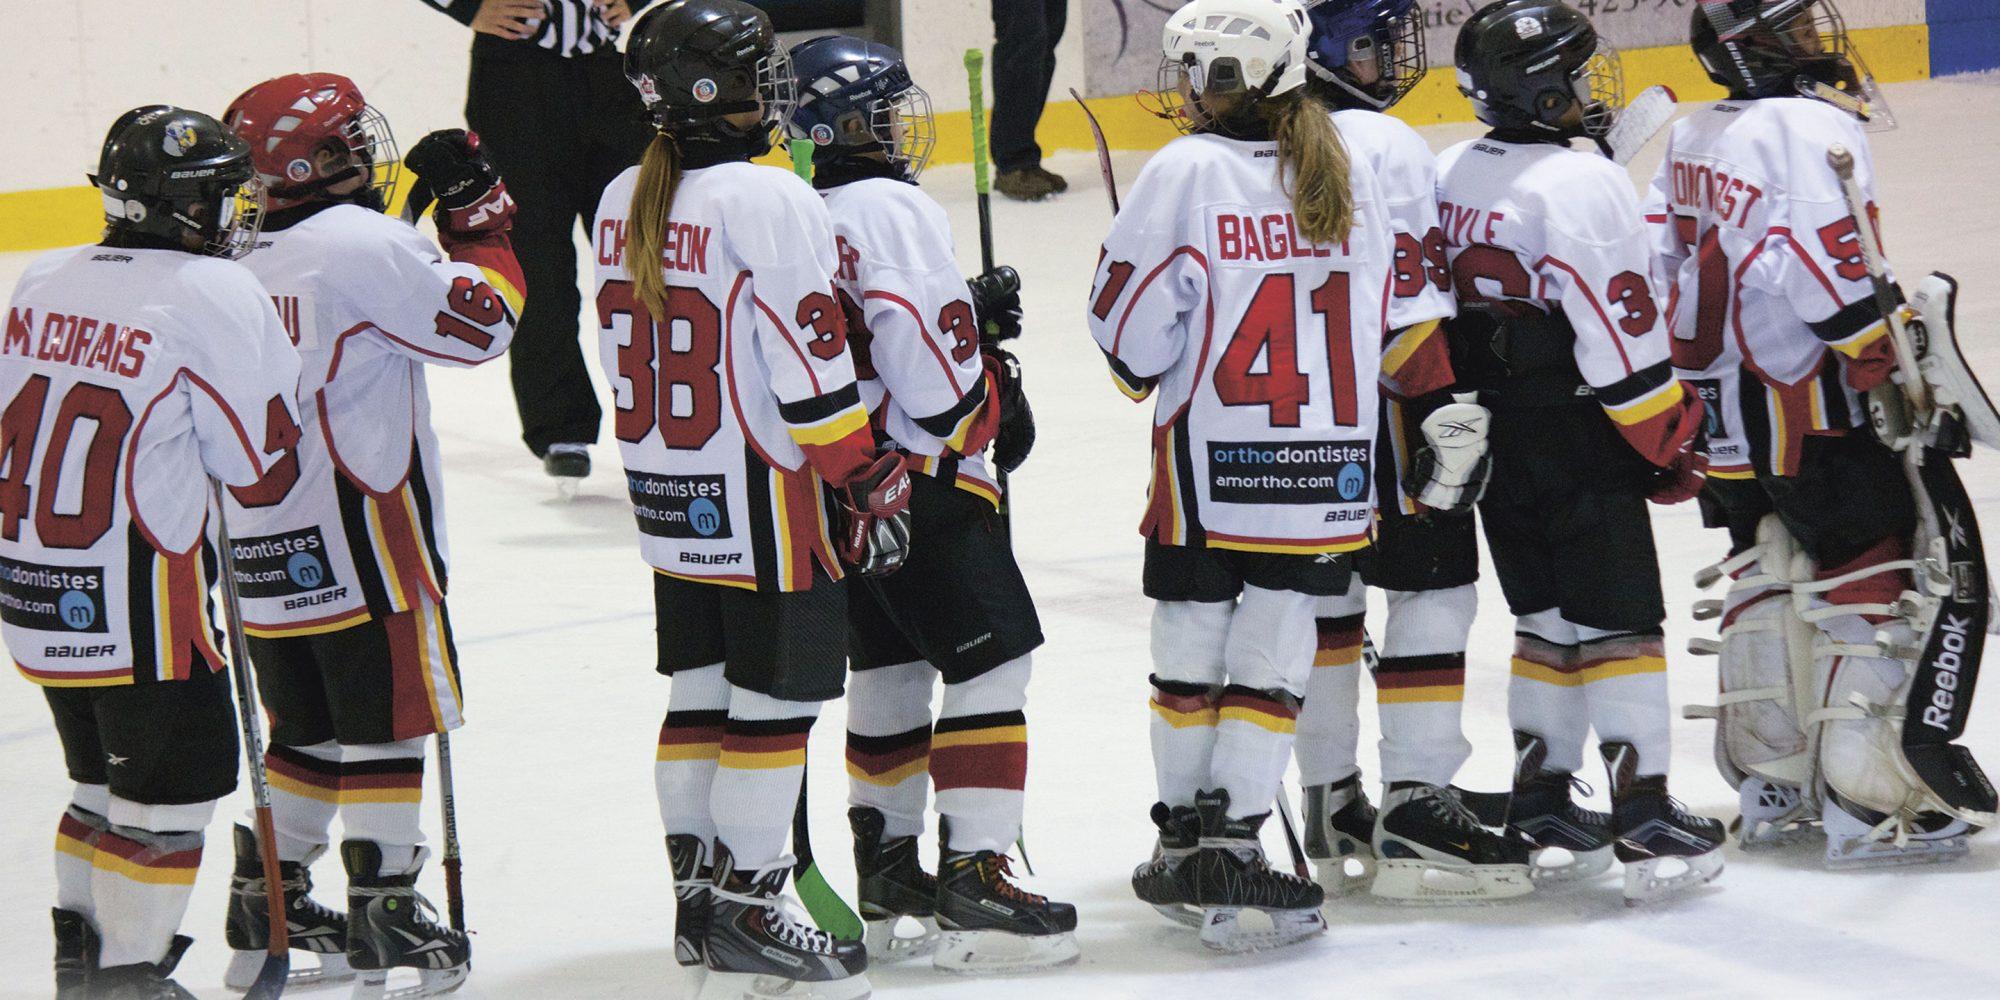 Hockey mineur et joies majeures